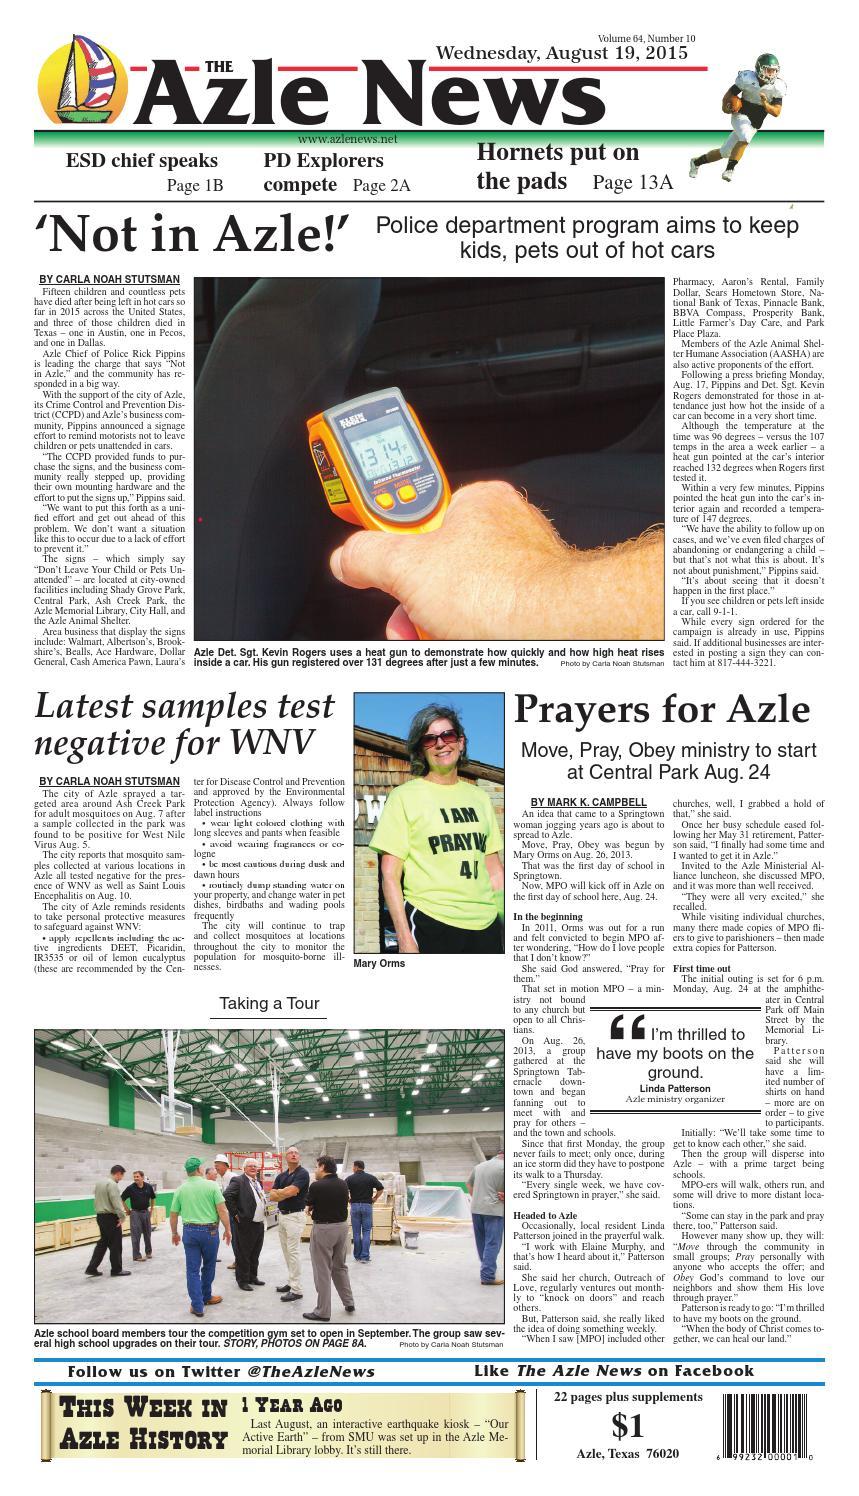 The Azle News by Admin - issuu